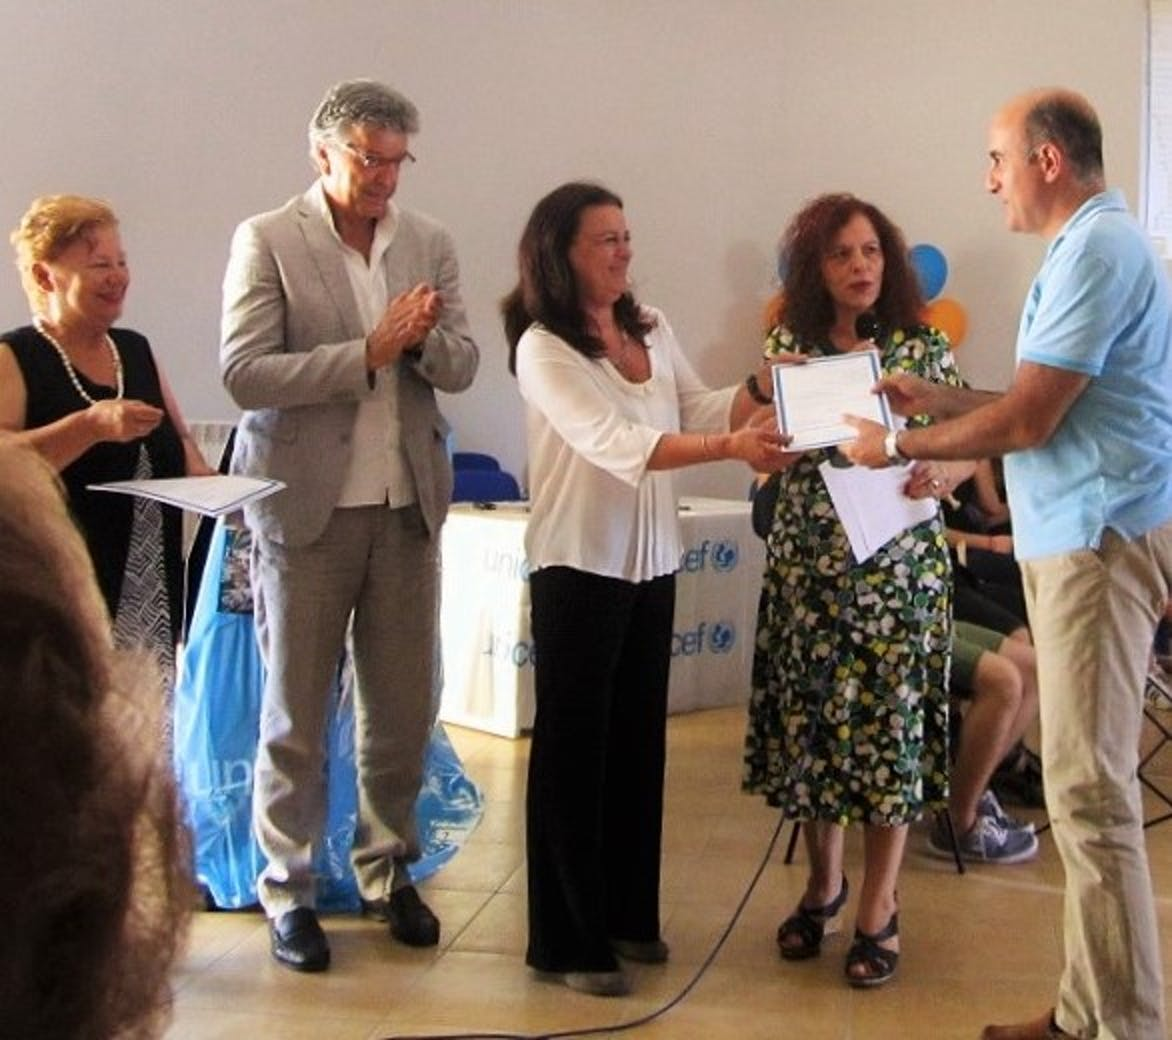 Da sinistra: Carmela Pace, Giuseppe Cappello, Manuela D'Alessandro, Angelica Romano, Salvatore Cantone